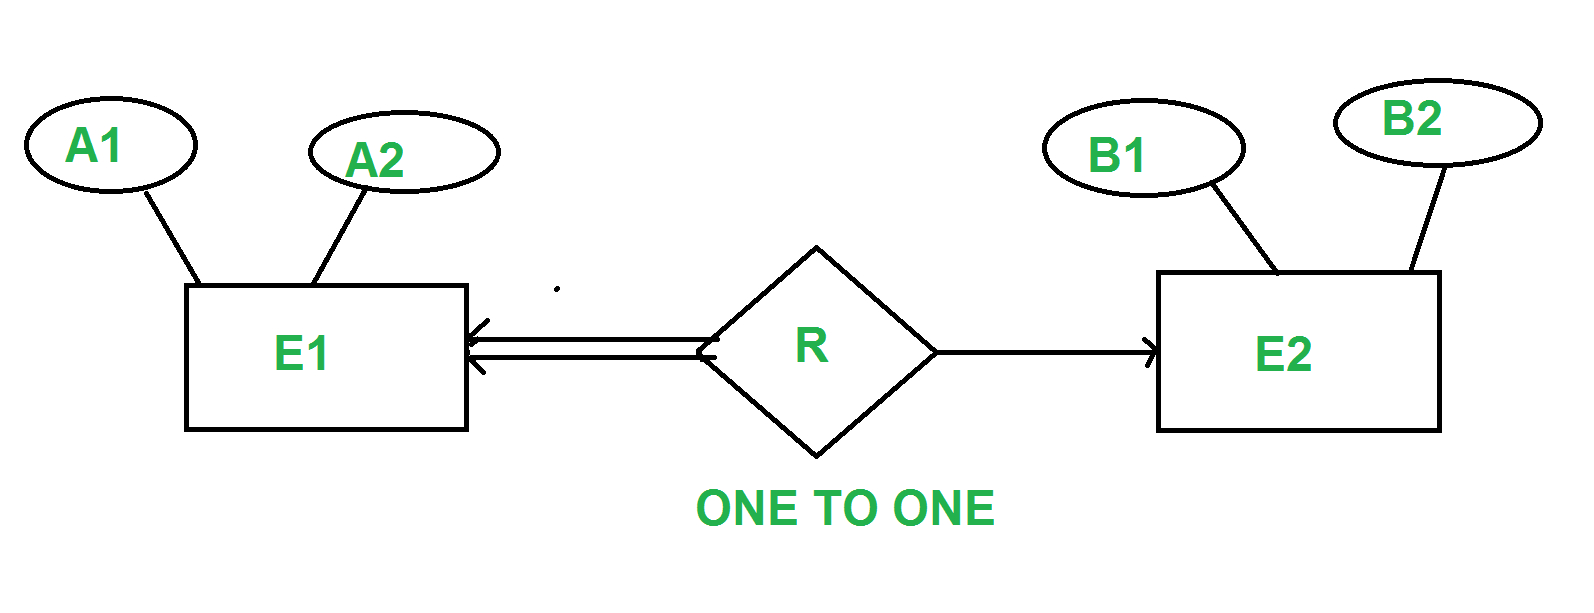 Minimization Of Er Diagrams - Geeksforgeeks within Er Diagram Primary Key